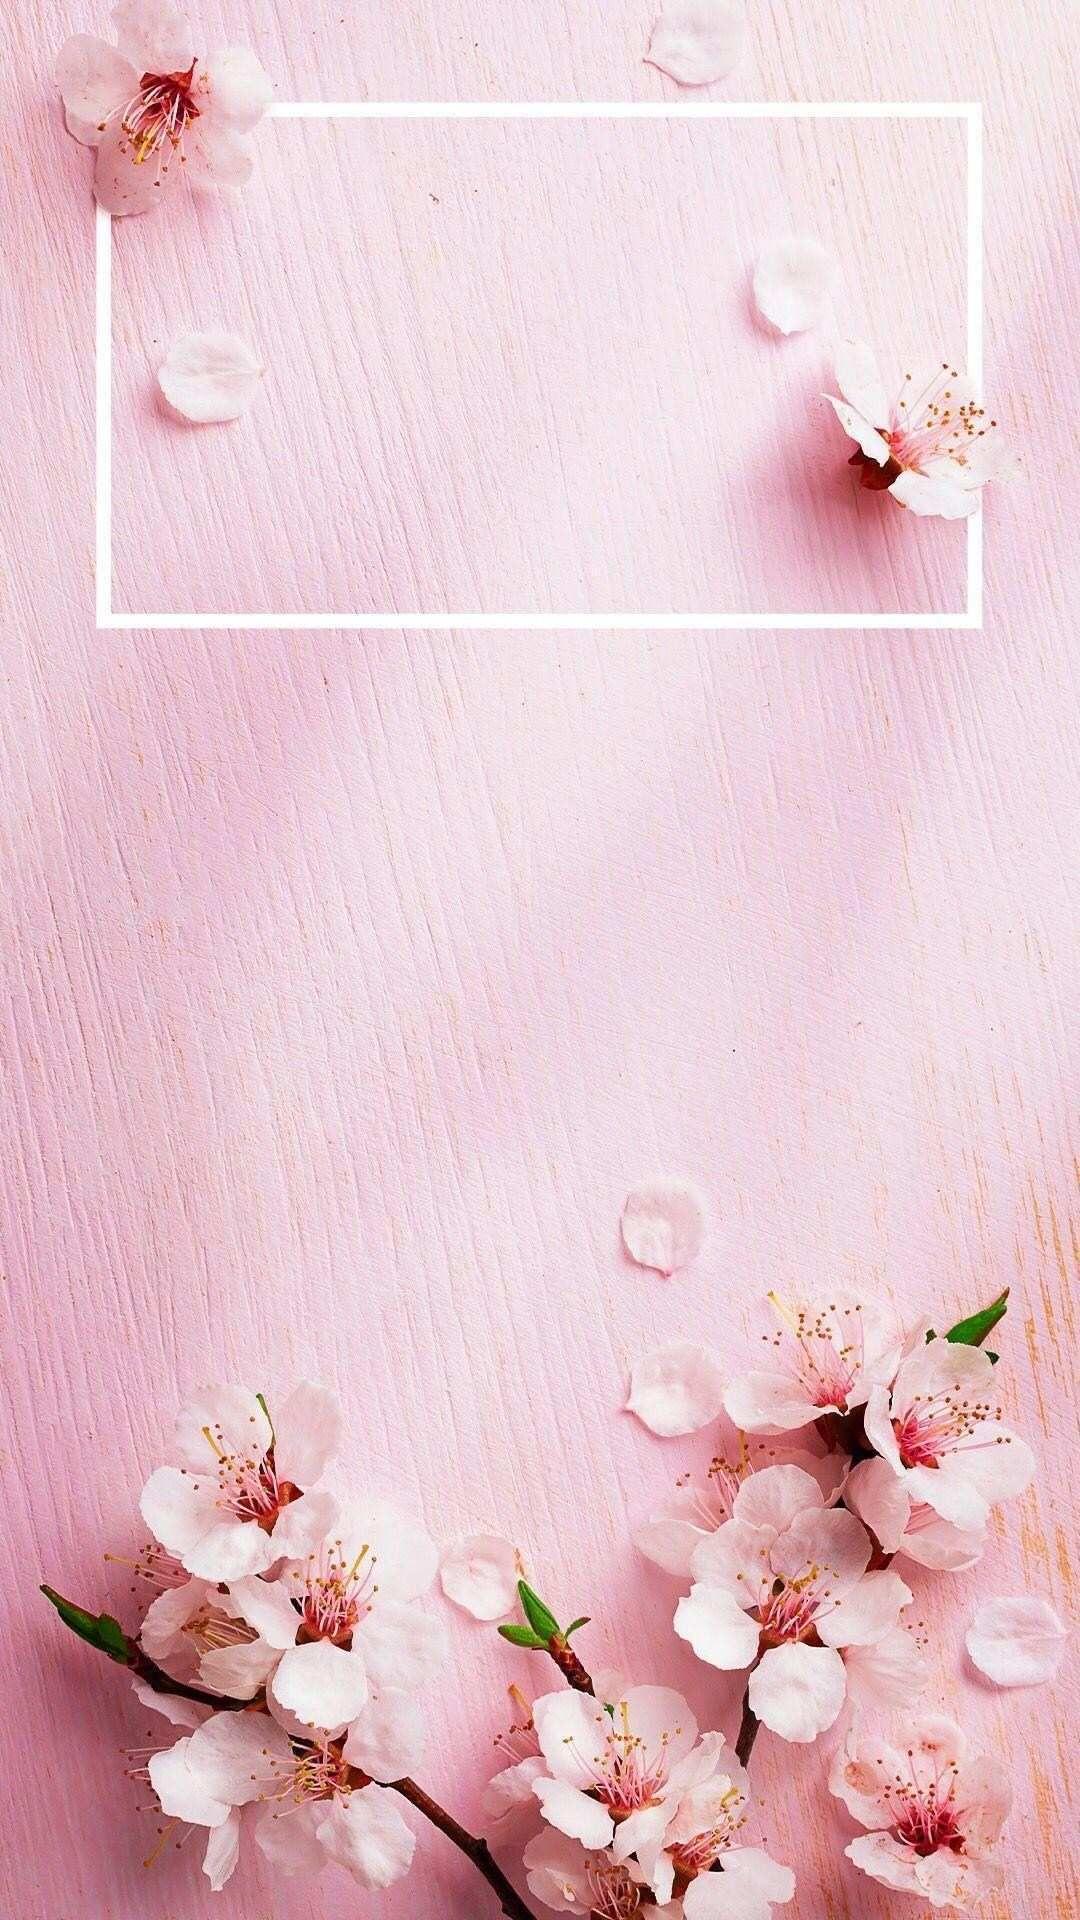 Rose Gold Wallpaper Iphone 7 Beautiful Rose Gold Wallpapers Wallpaper Cave Iphone Spring Wallpaper Spring Wallpaper Rose Gold Wallpaper